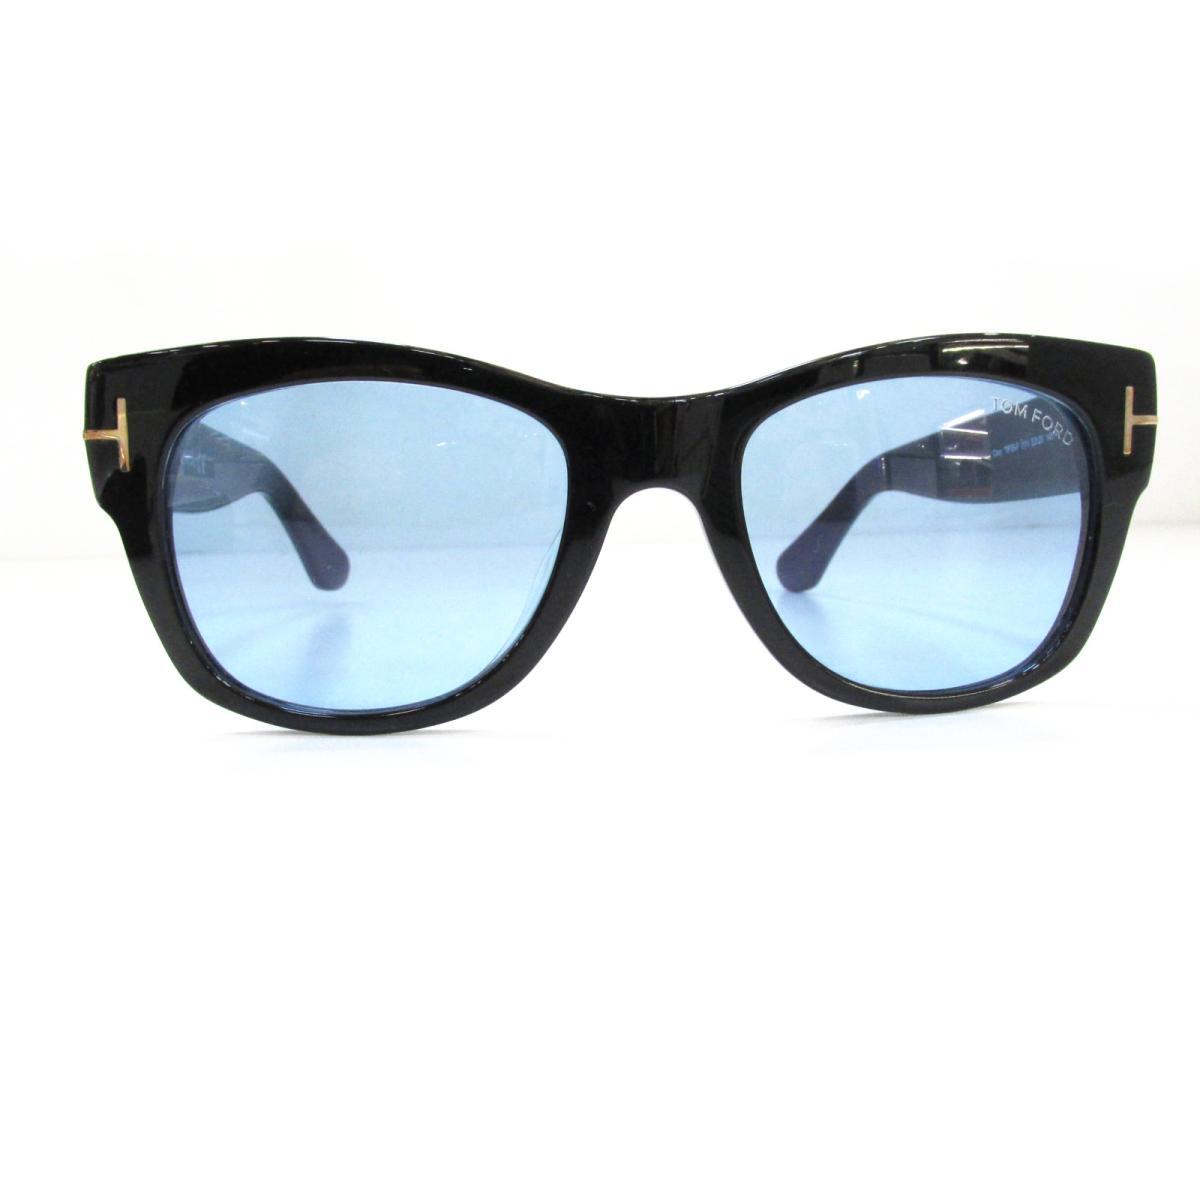 6f4c175ce95b4 BRANDOFF  Tom Ford sunglasses or other men s plastic black X blue ...